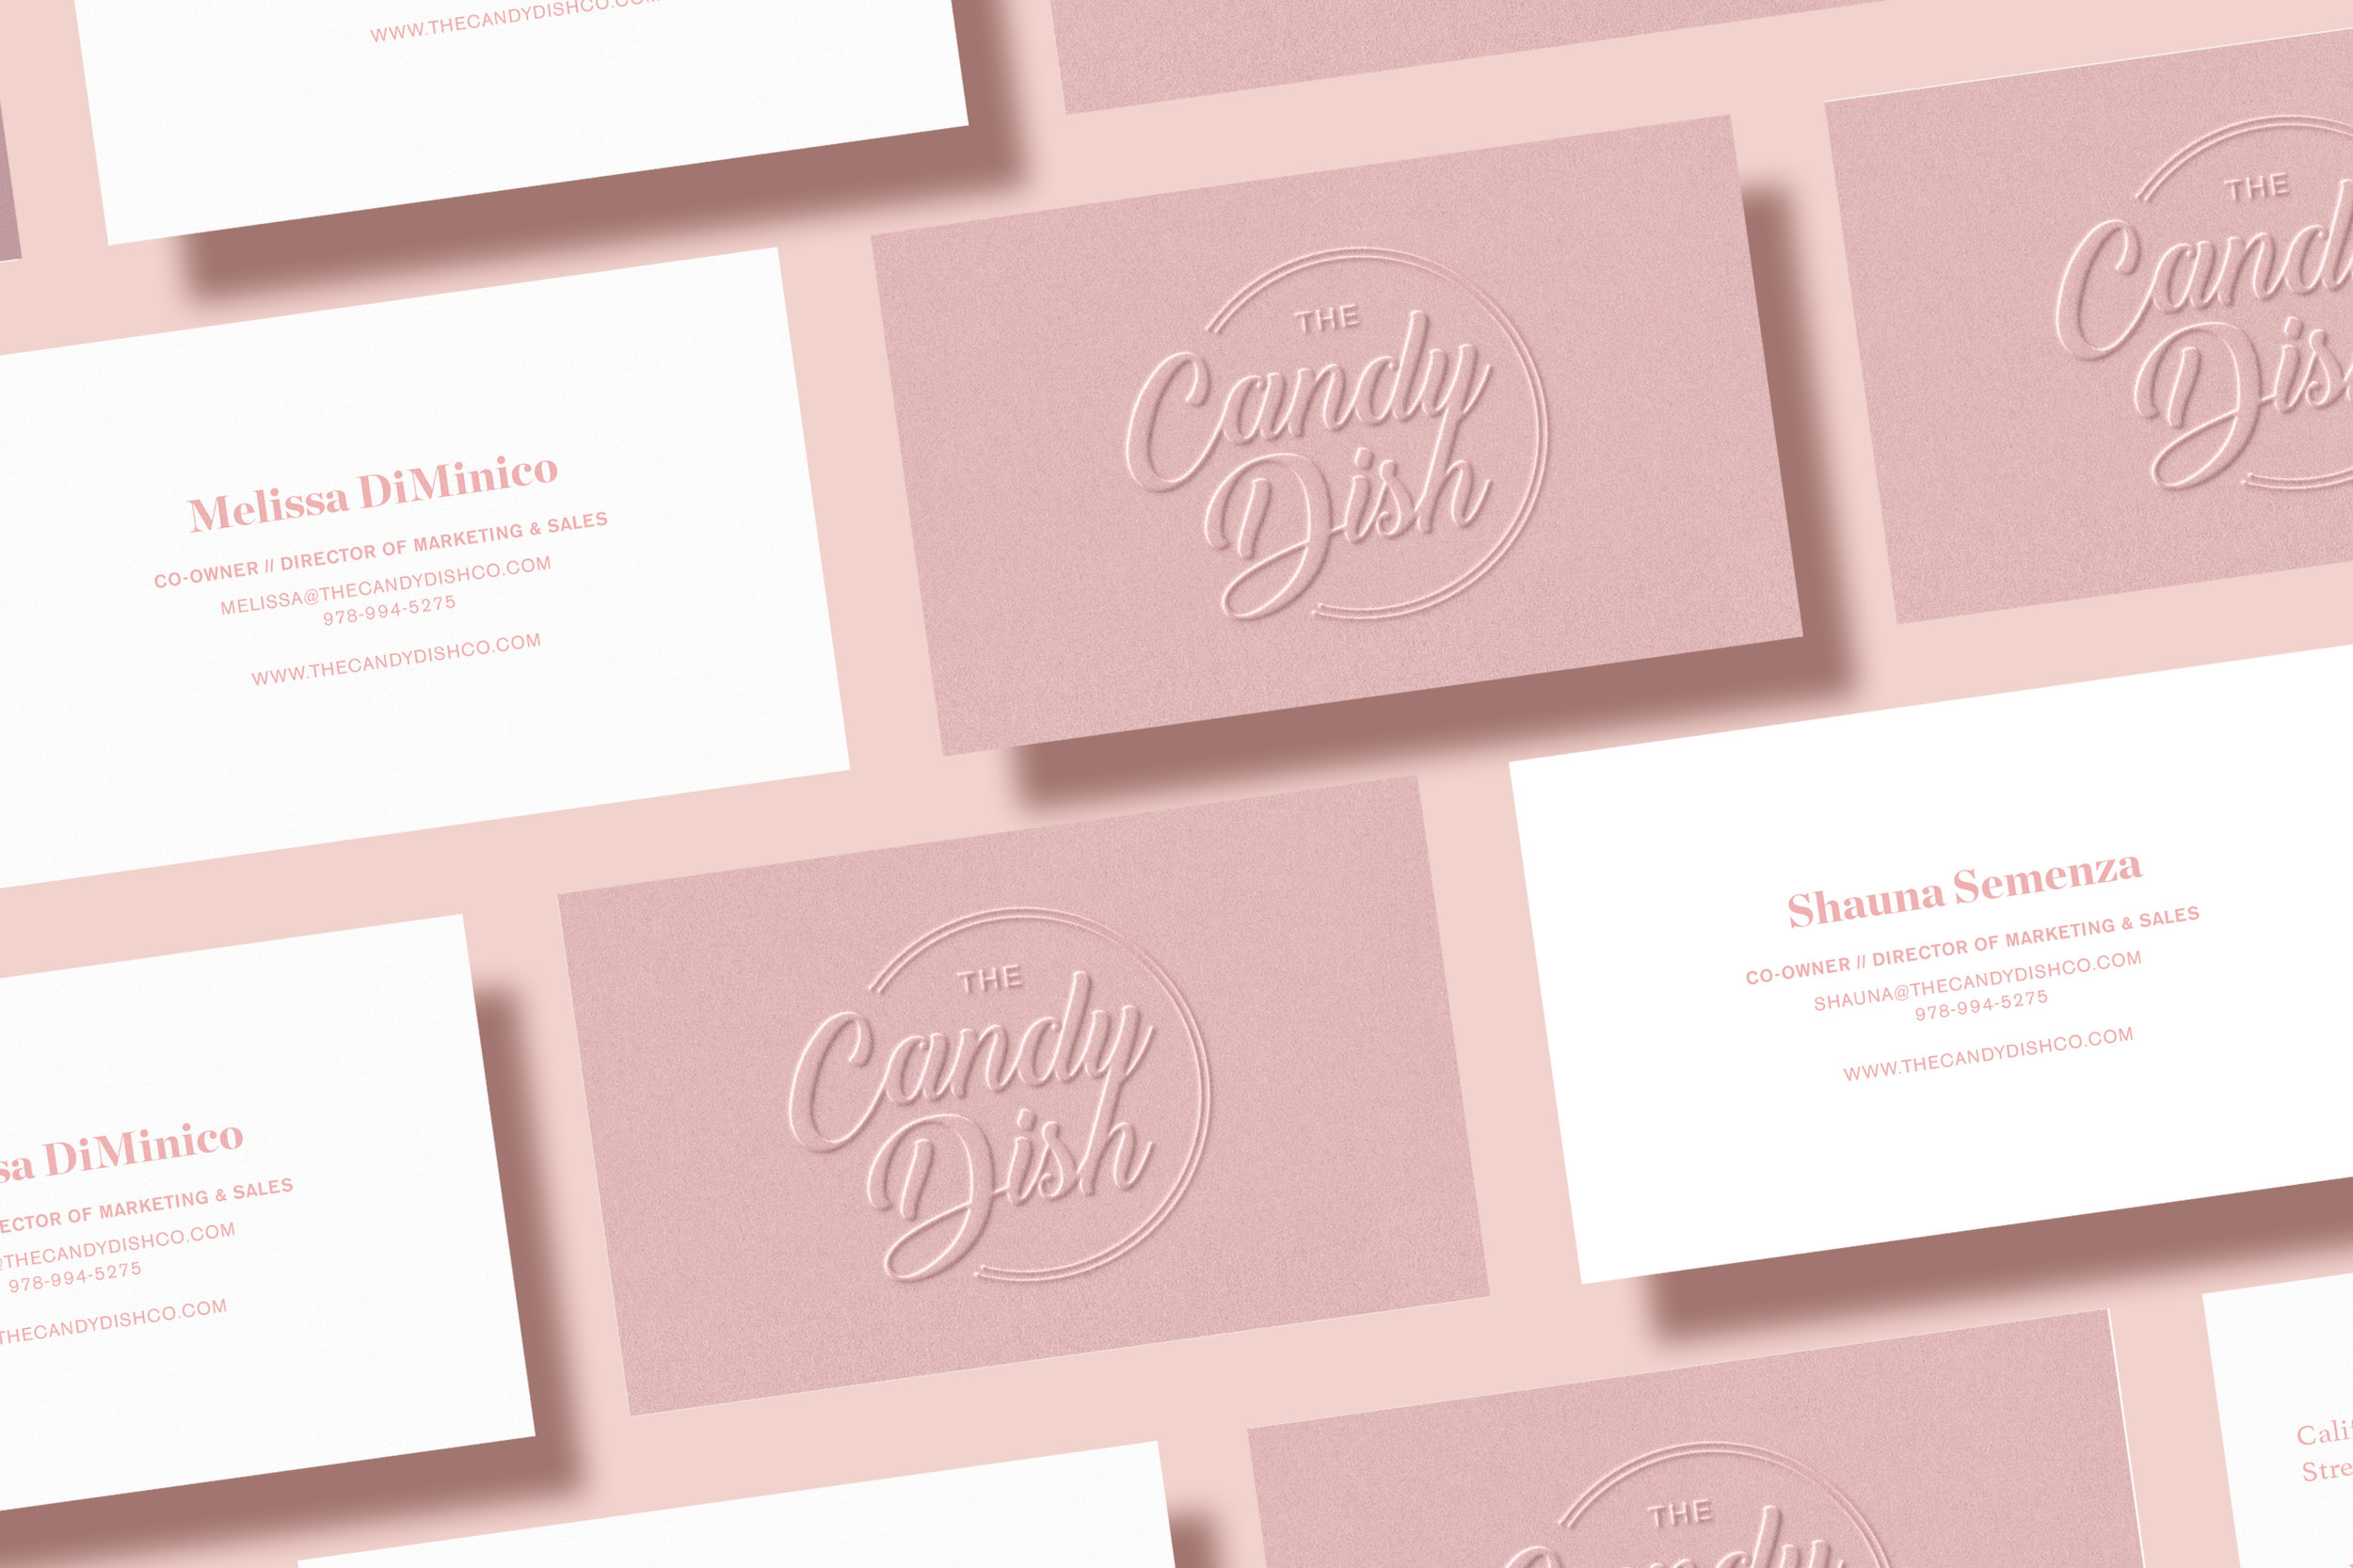 The Candy Dish Co - branding, web design, print design